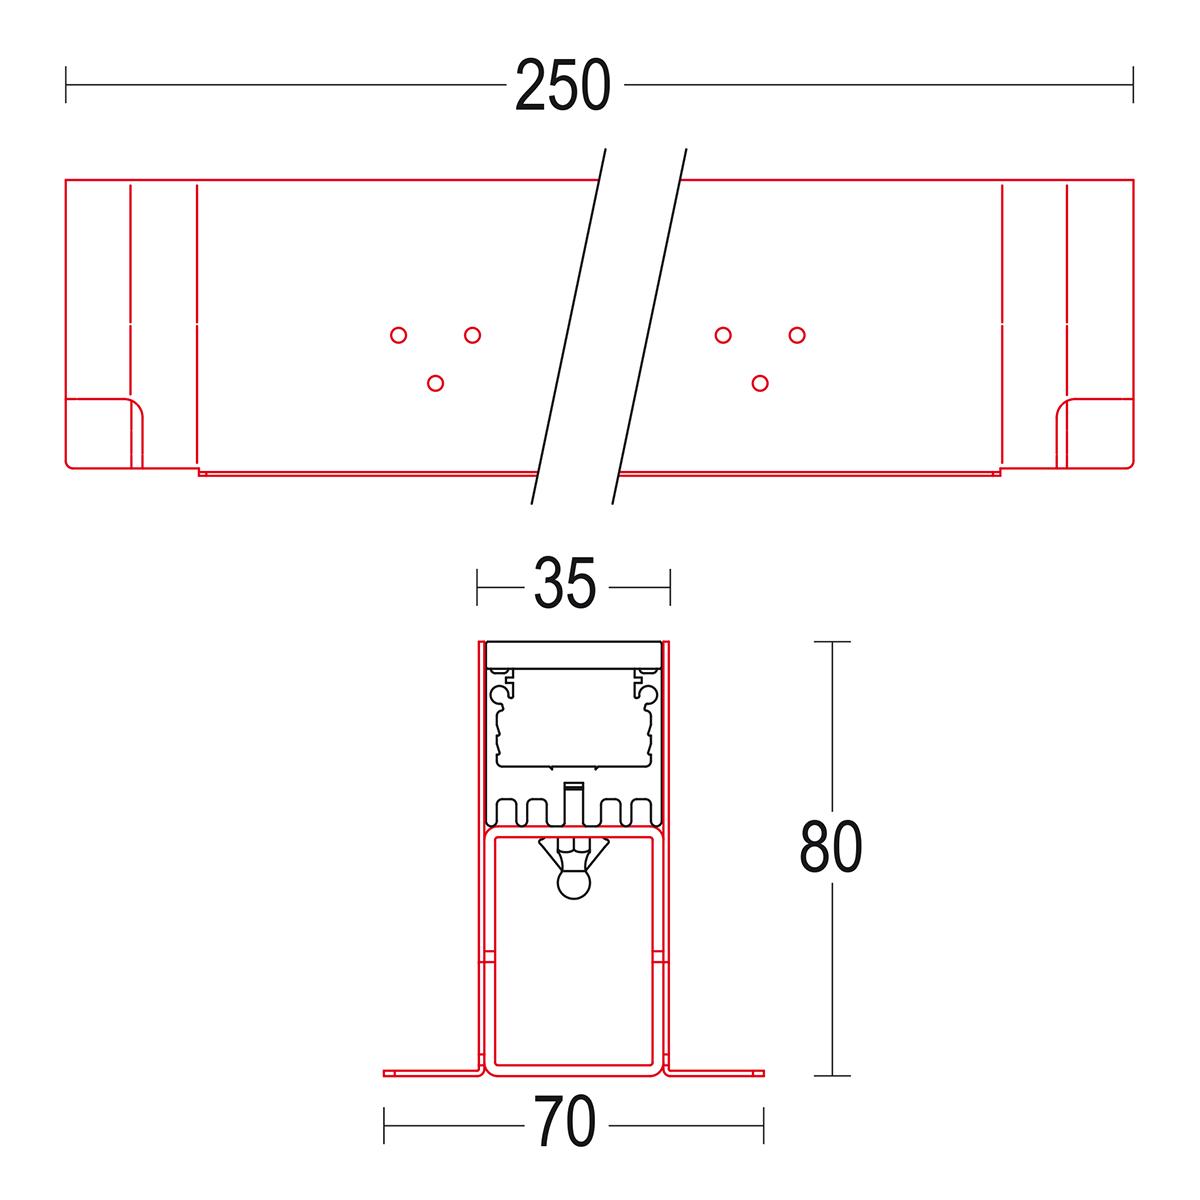 чертеж Traccia 250 Ghidini уличный светильник GH1530.BGXA300EL